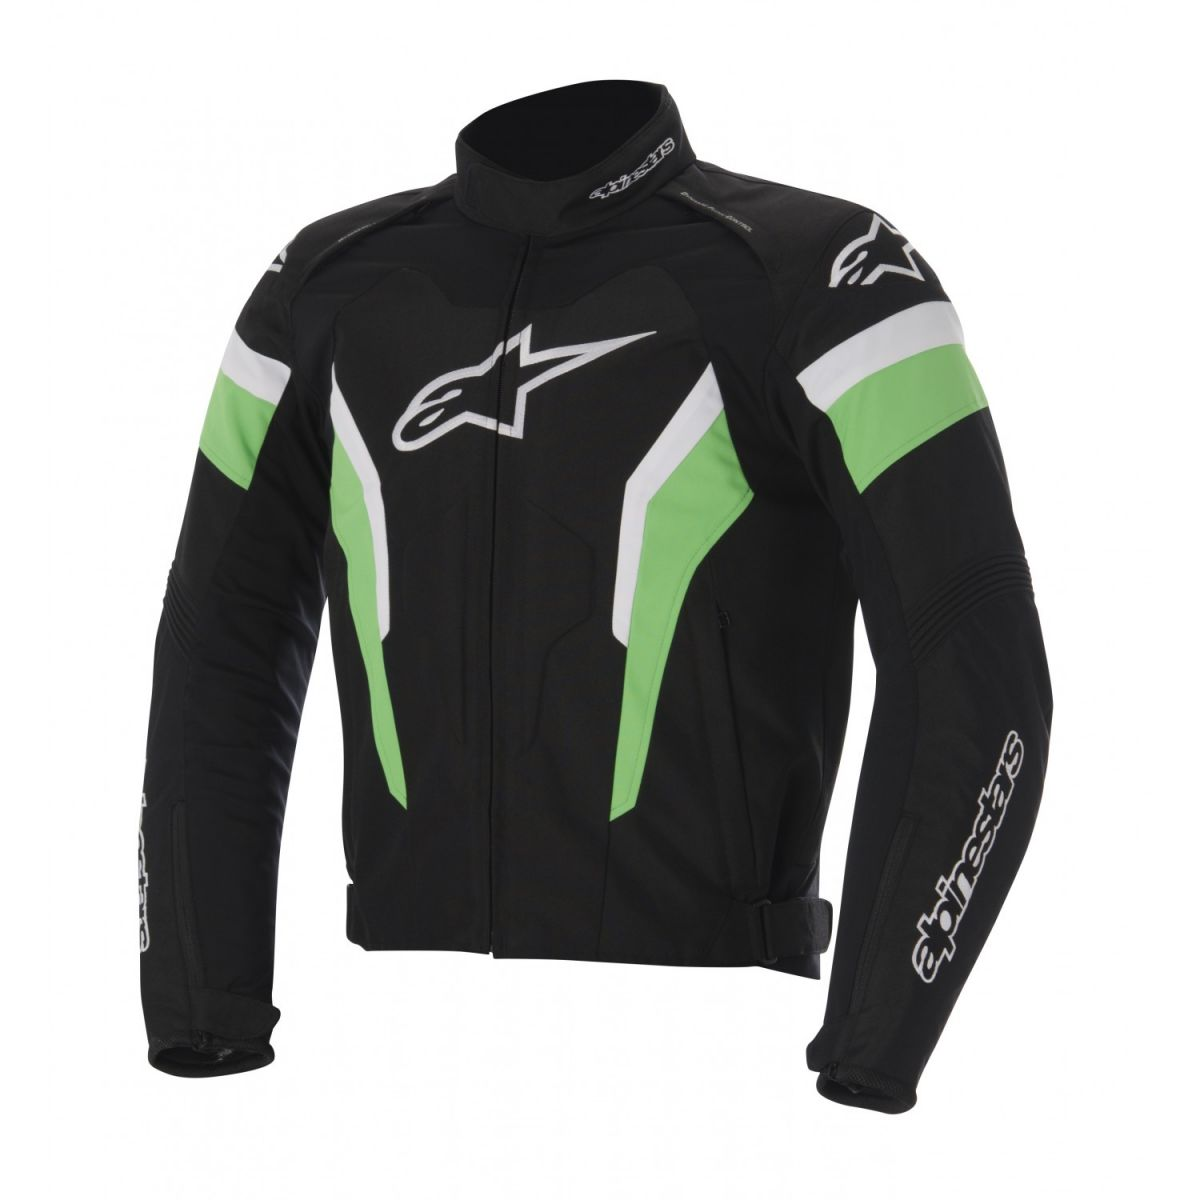 Jaqueta Alpinestars T GP Pro (Preta Verde)  - Super Bike - Loja Oficial Alpinestars